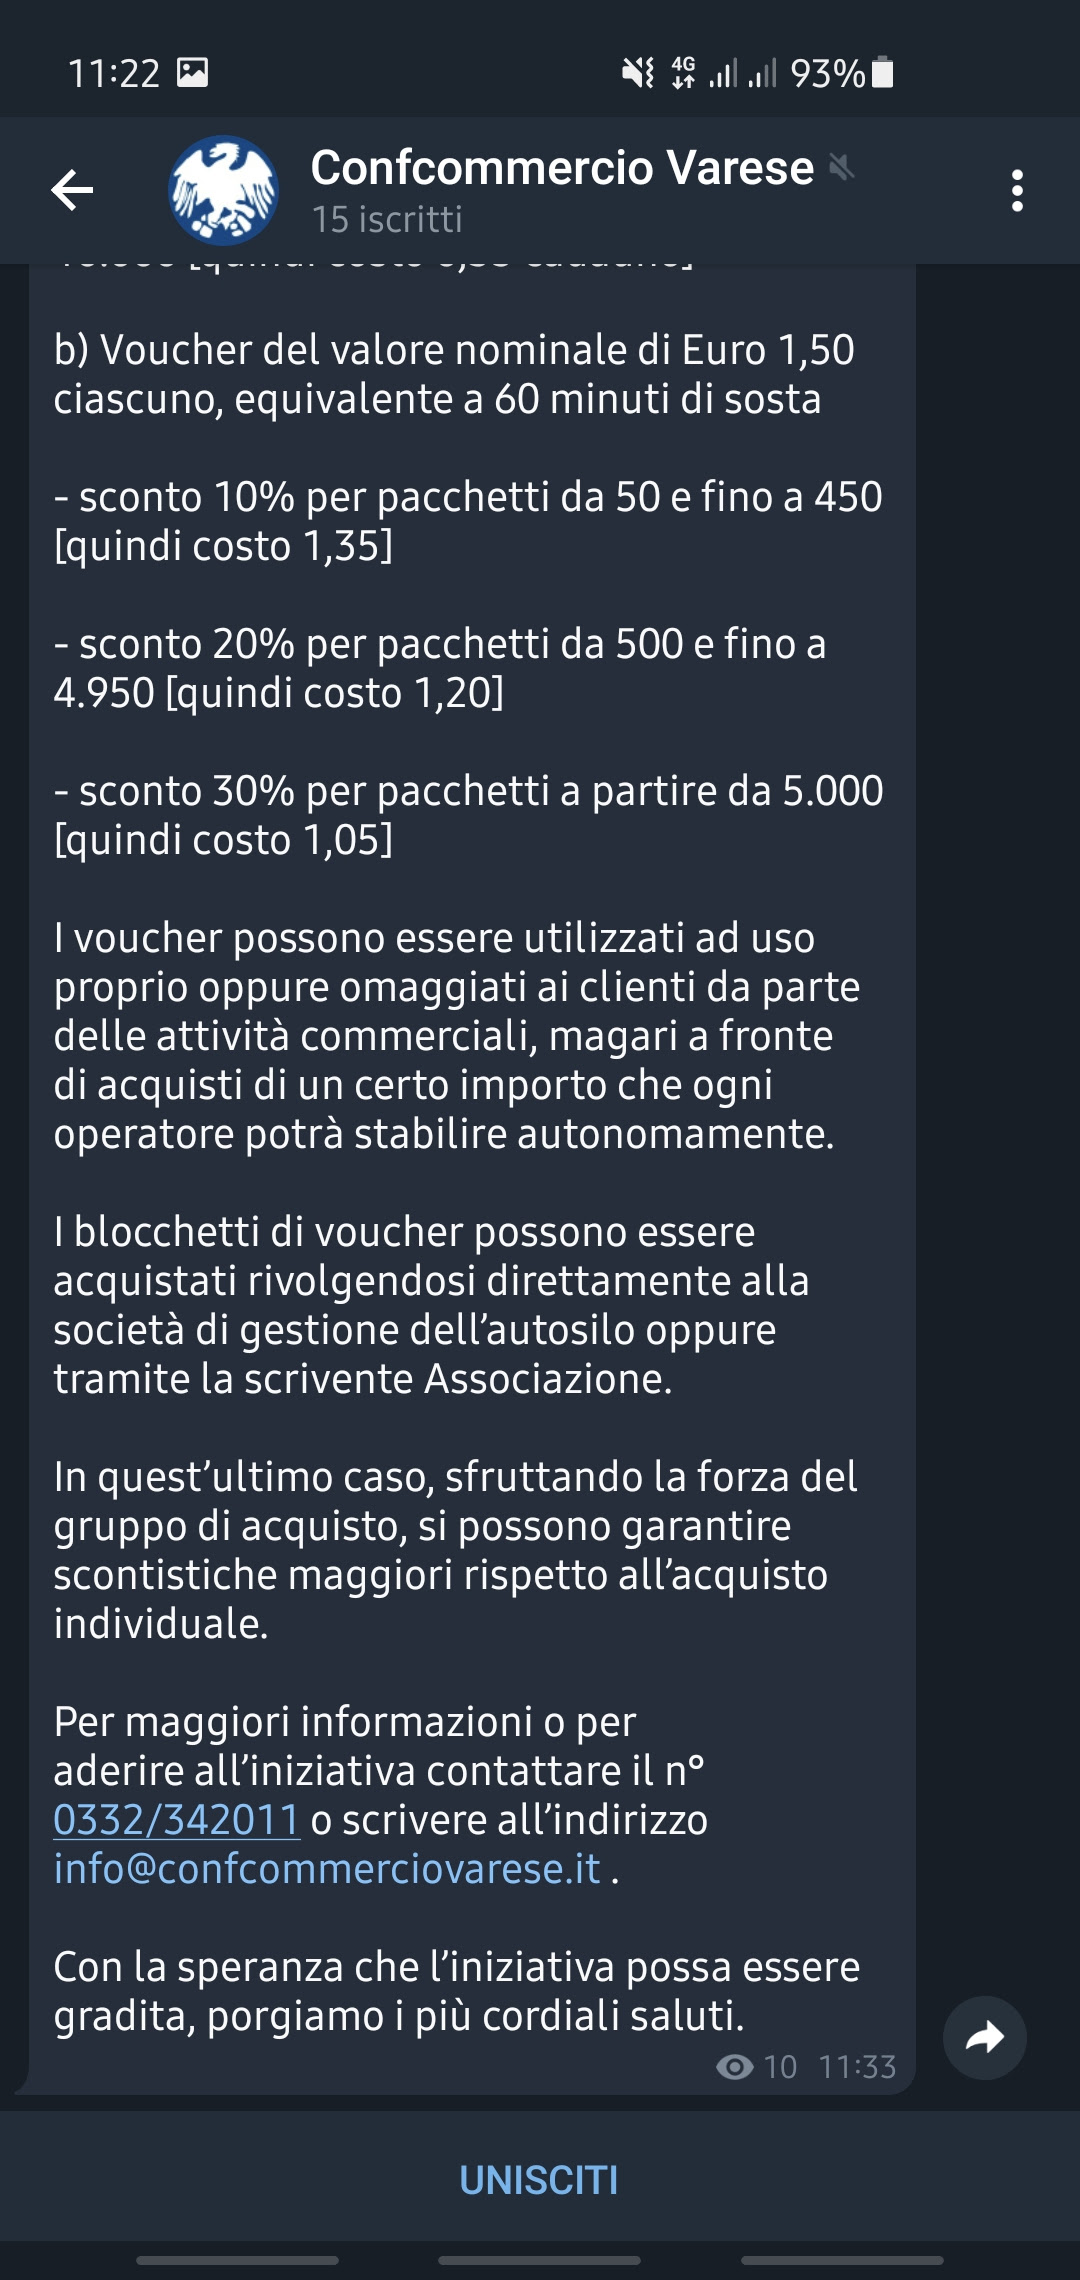 Telegram adesione gruppo Confcommercio